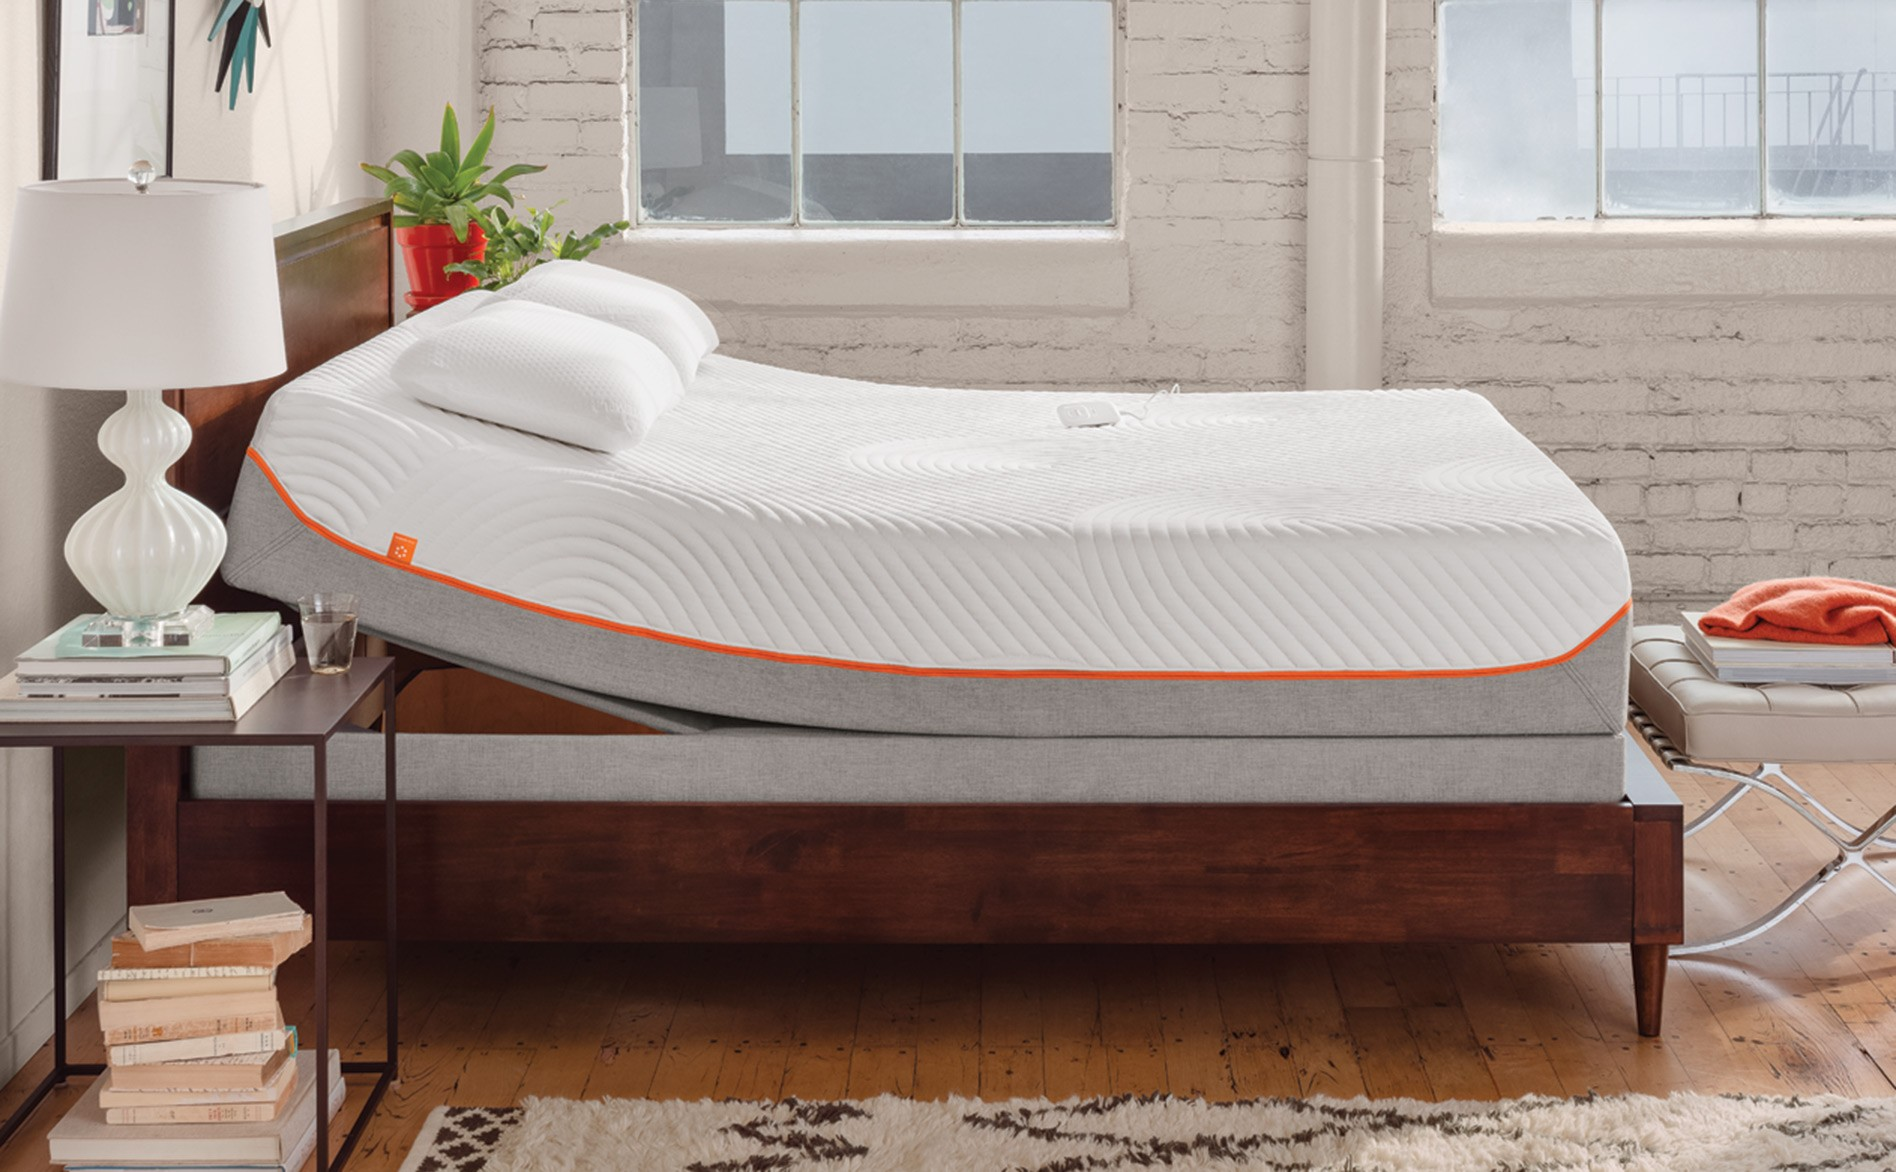 tempurpedic bed rug lamp books table windows pillows